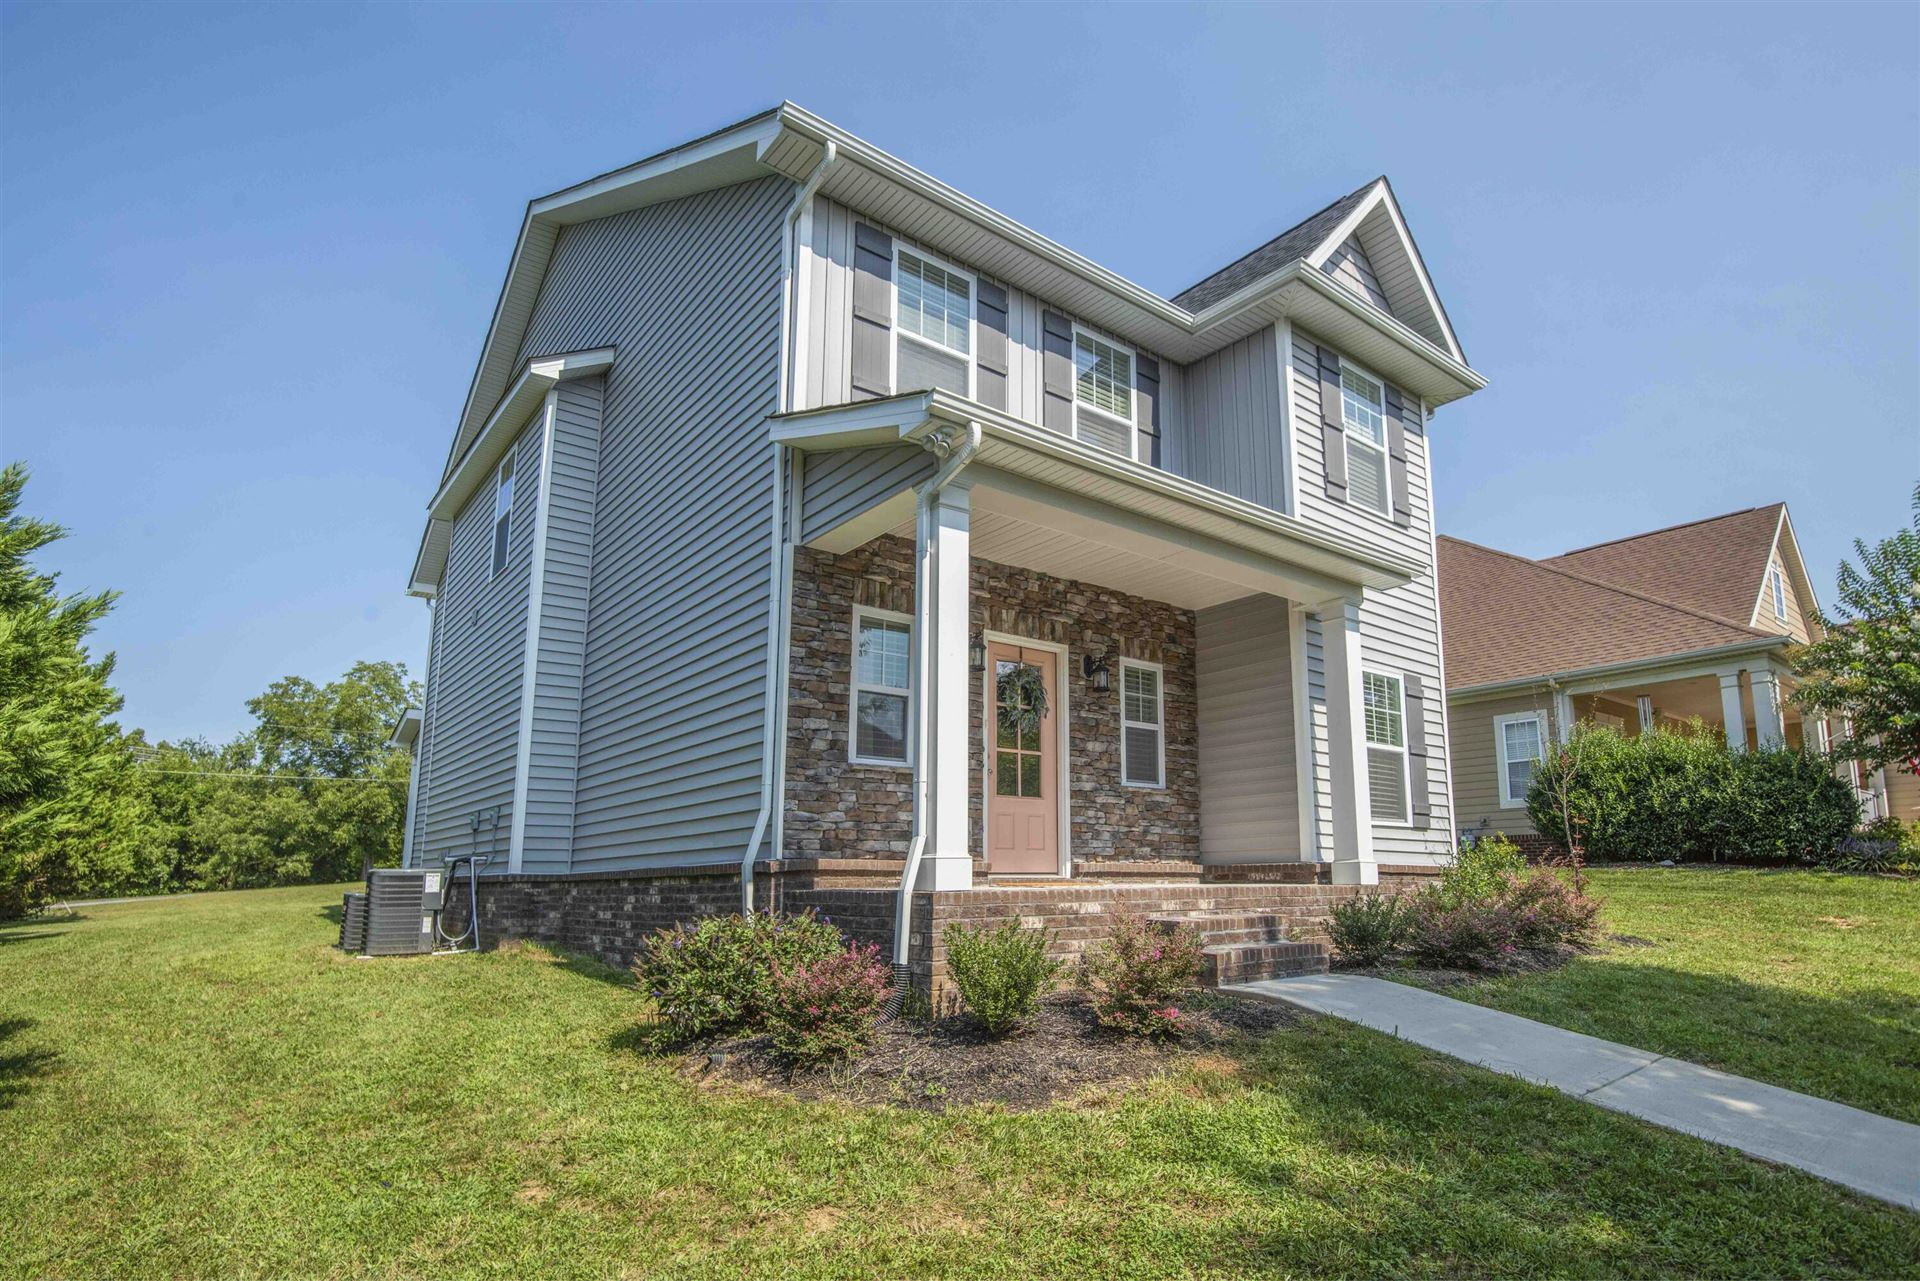 Photo of 138 Fallberry St, Oak Ridge, TN 37830 (MLS # 1167294)